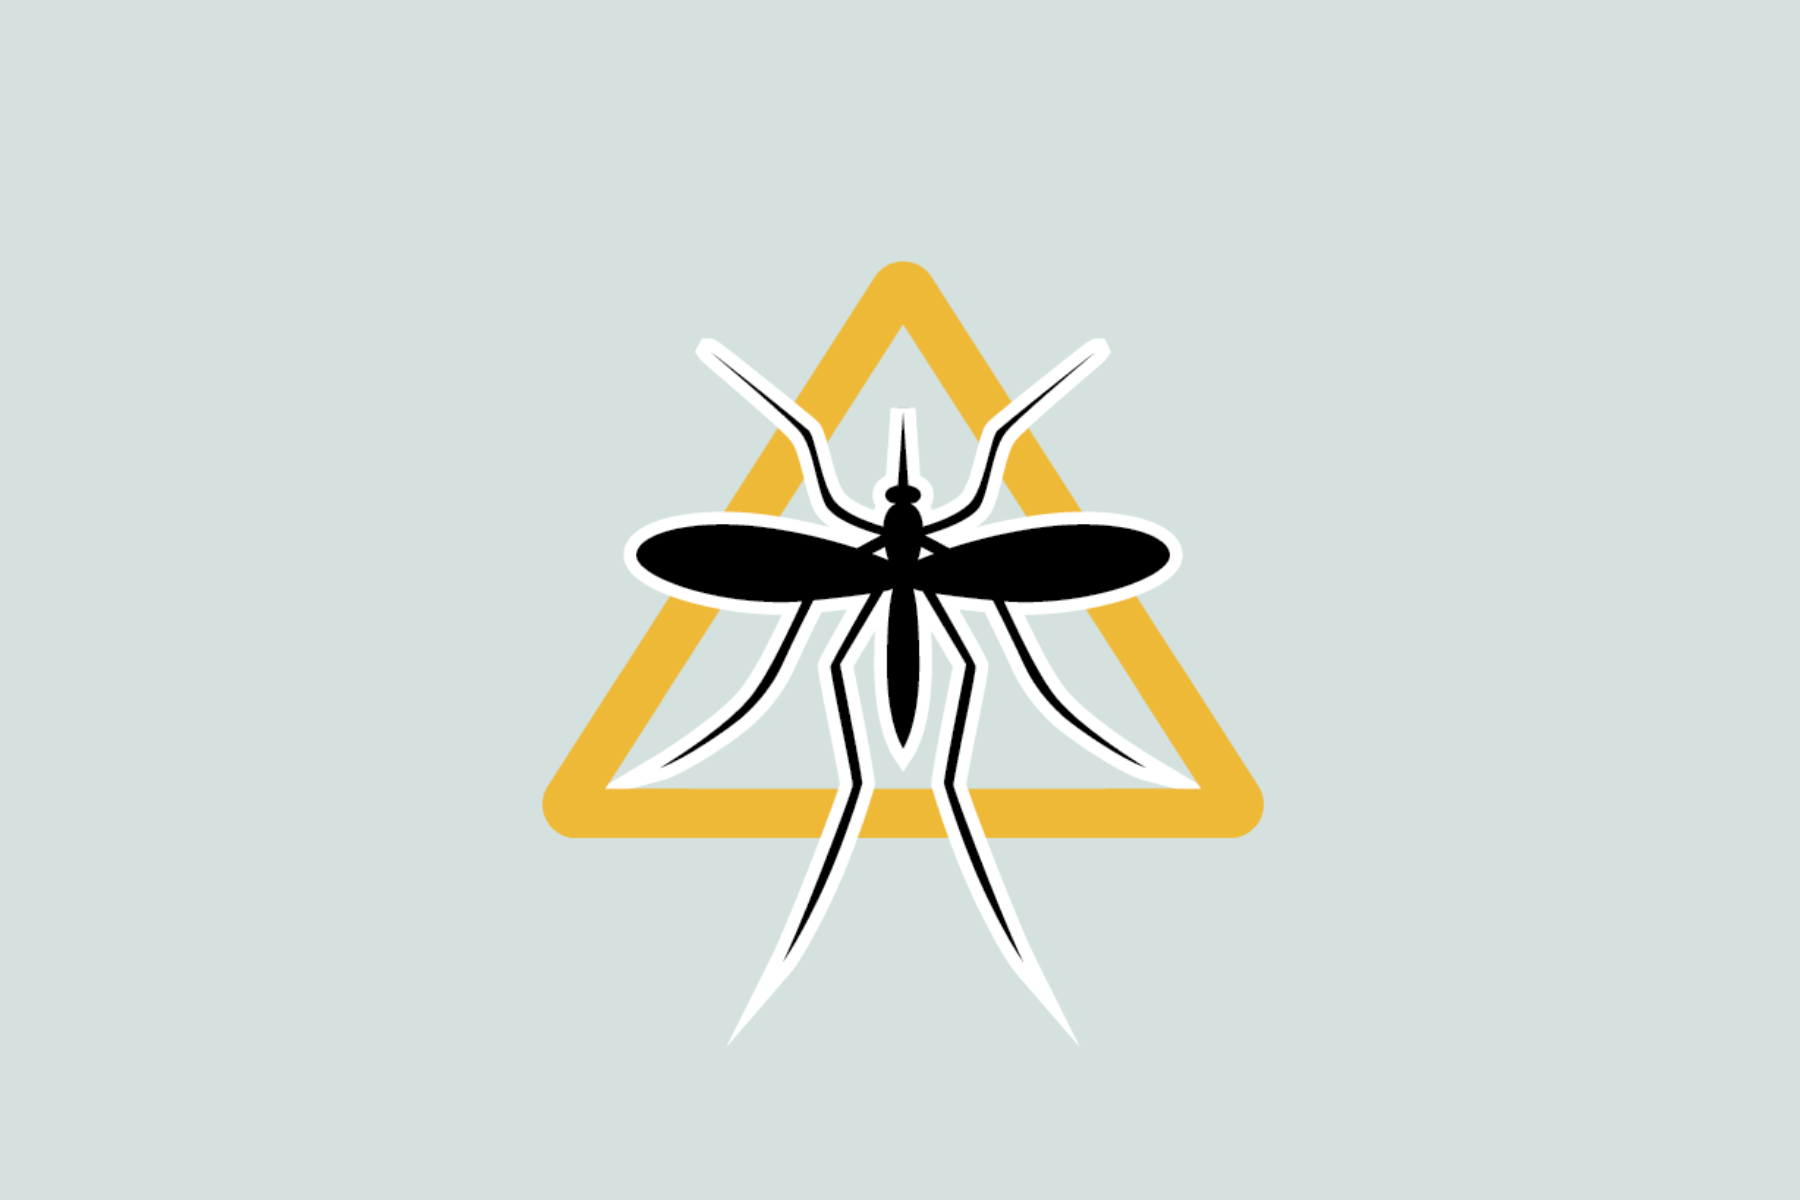 Stopping dengue at the source